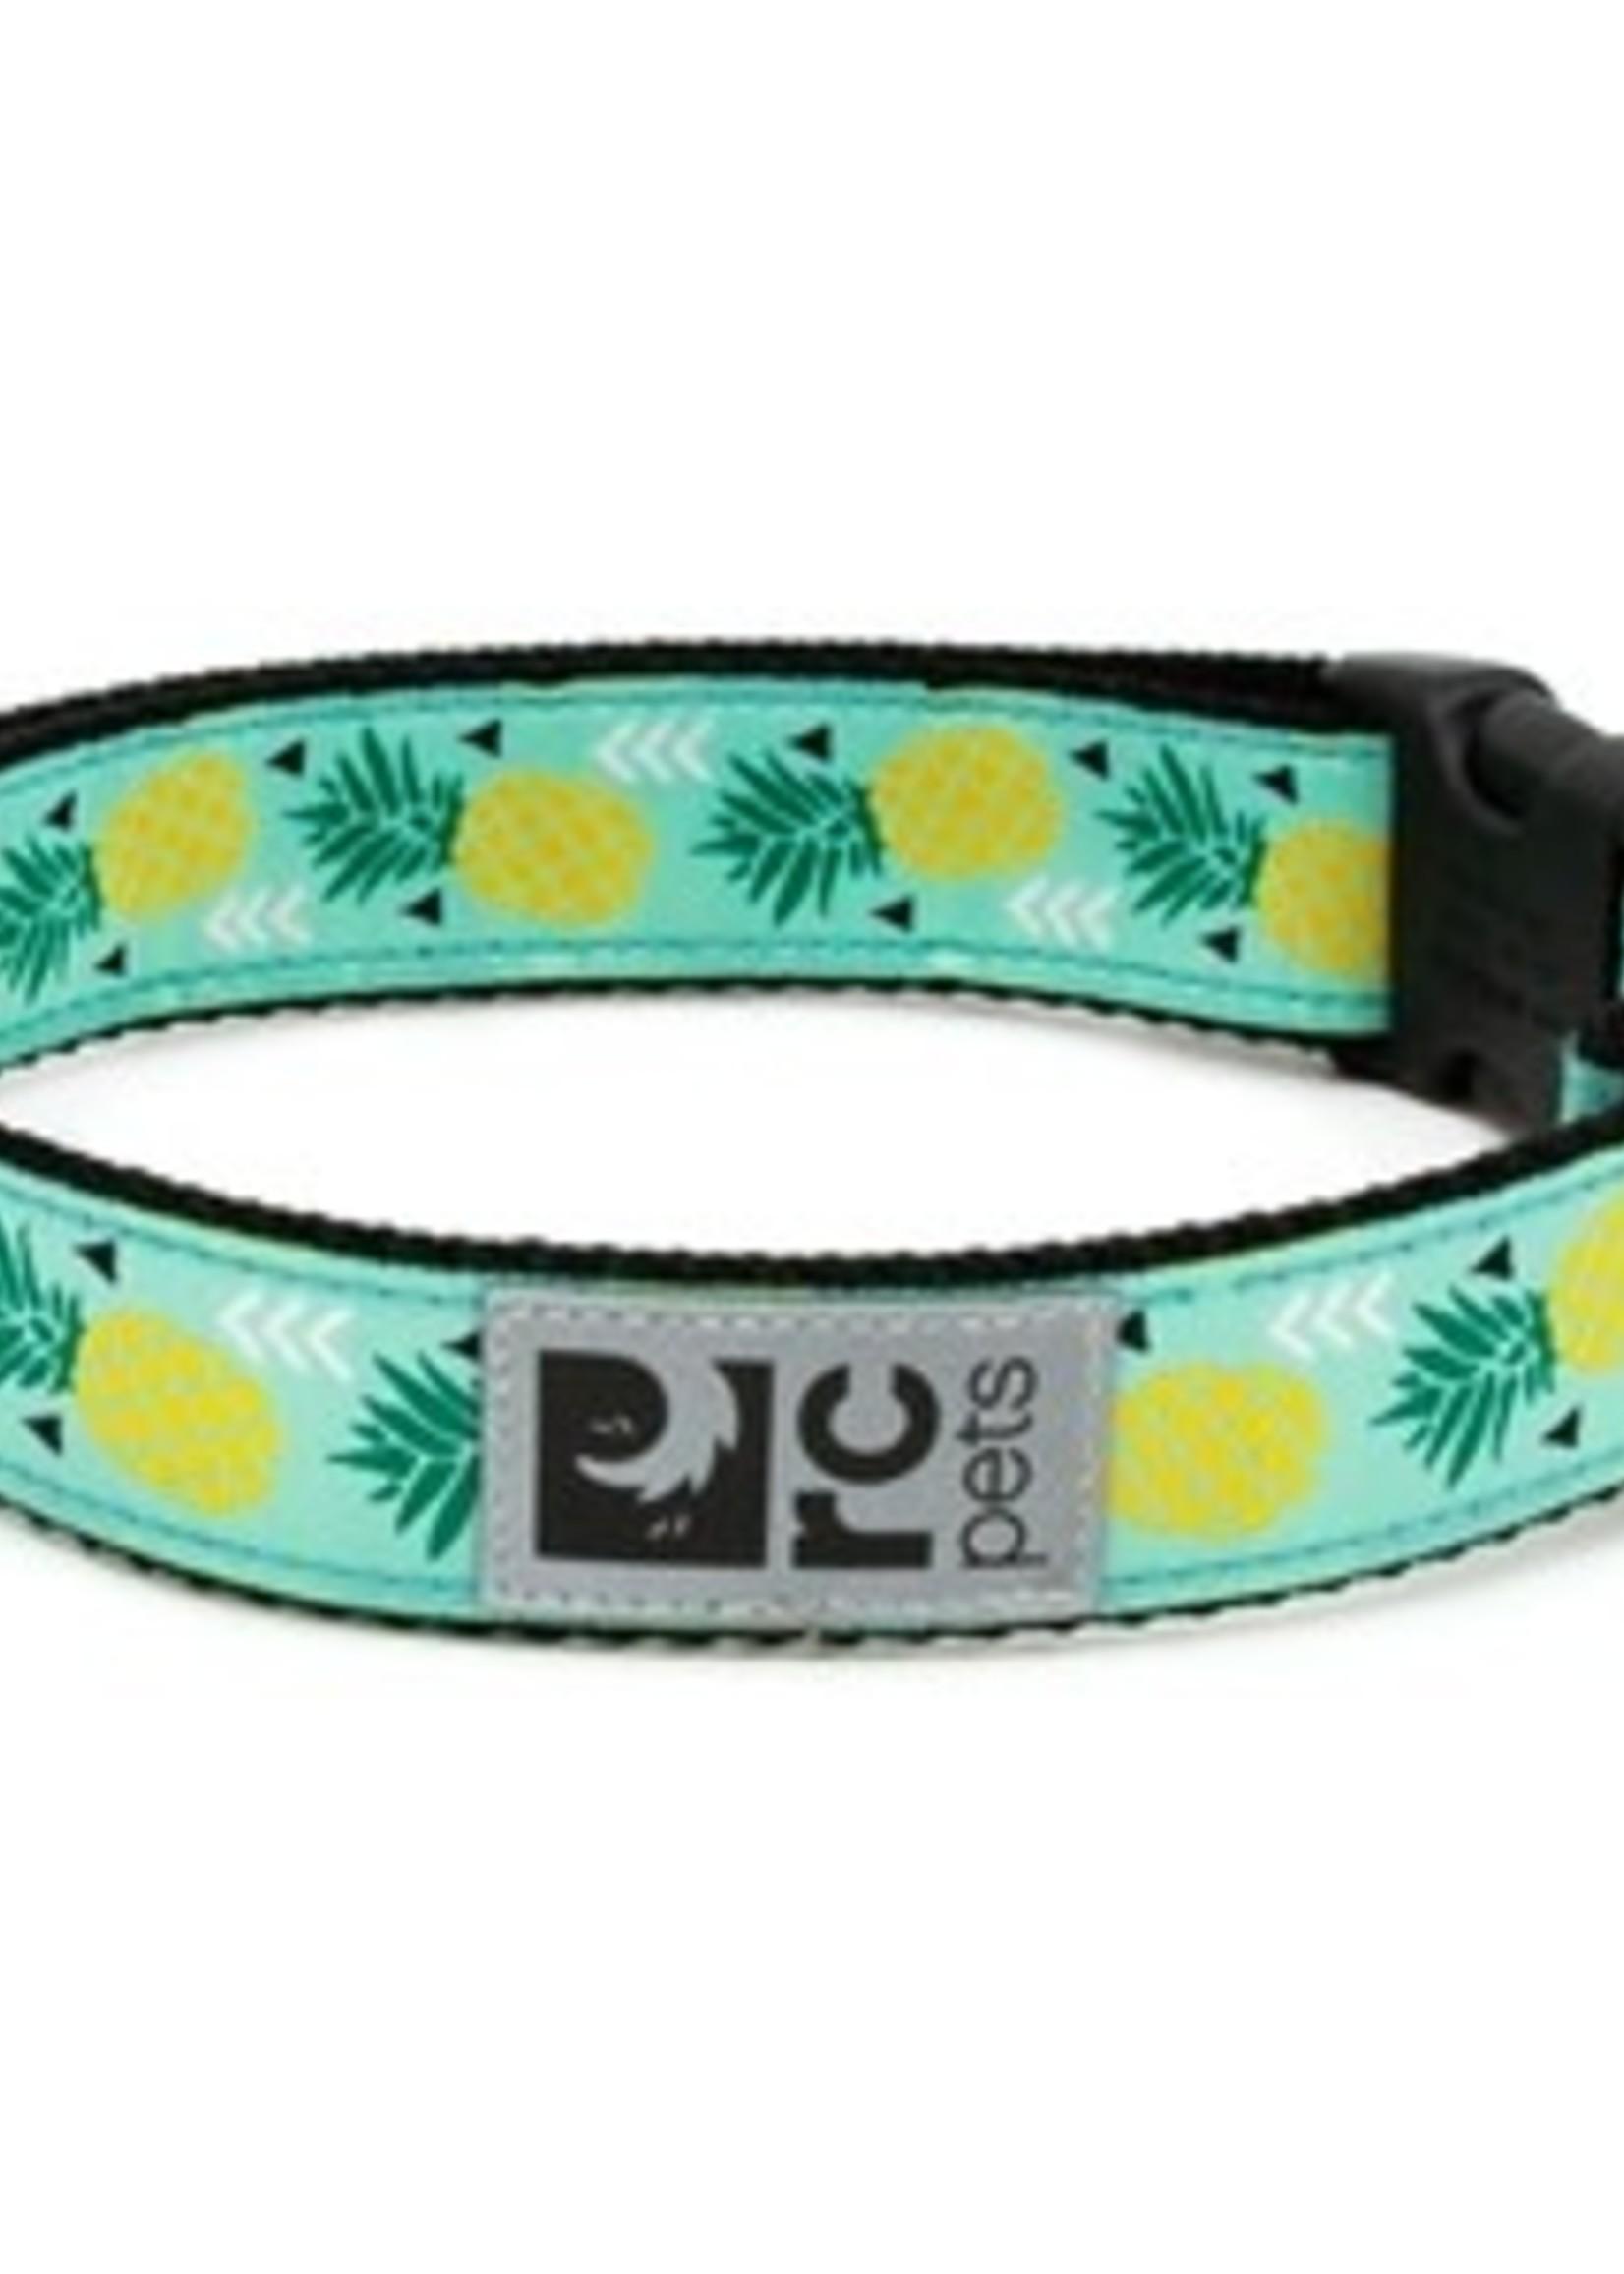 RC Pets Clip Collar - Pineapple Parade